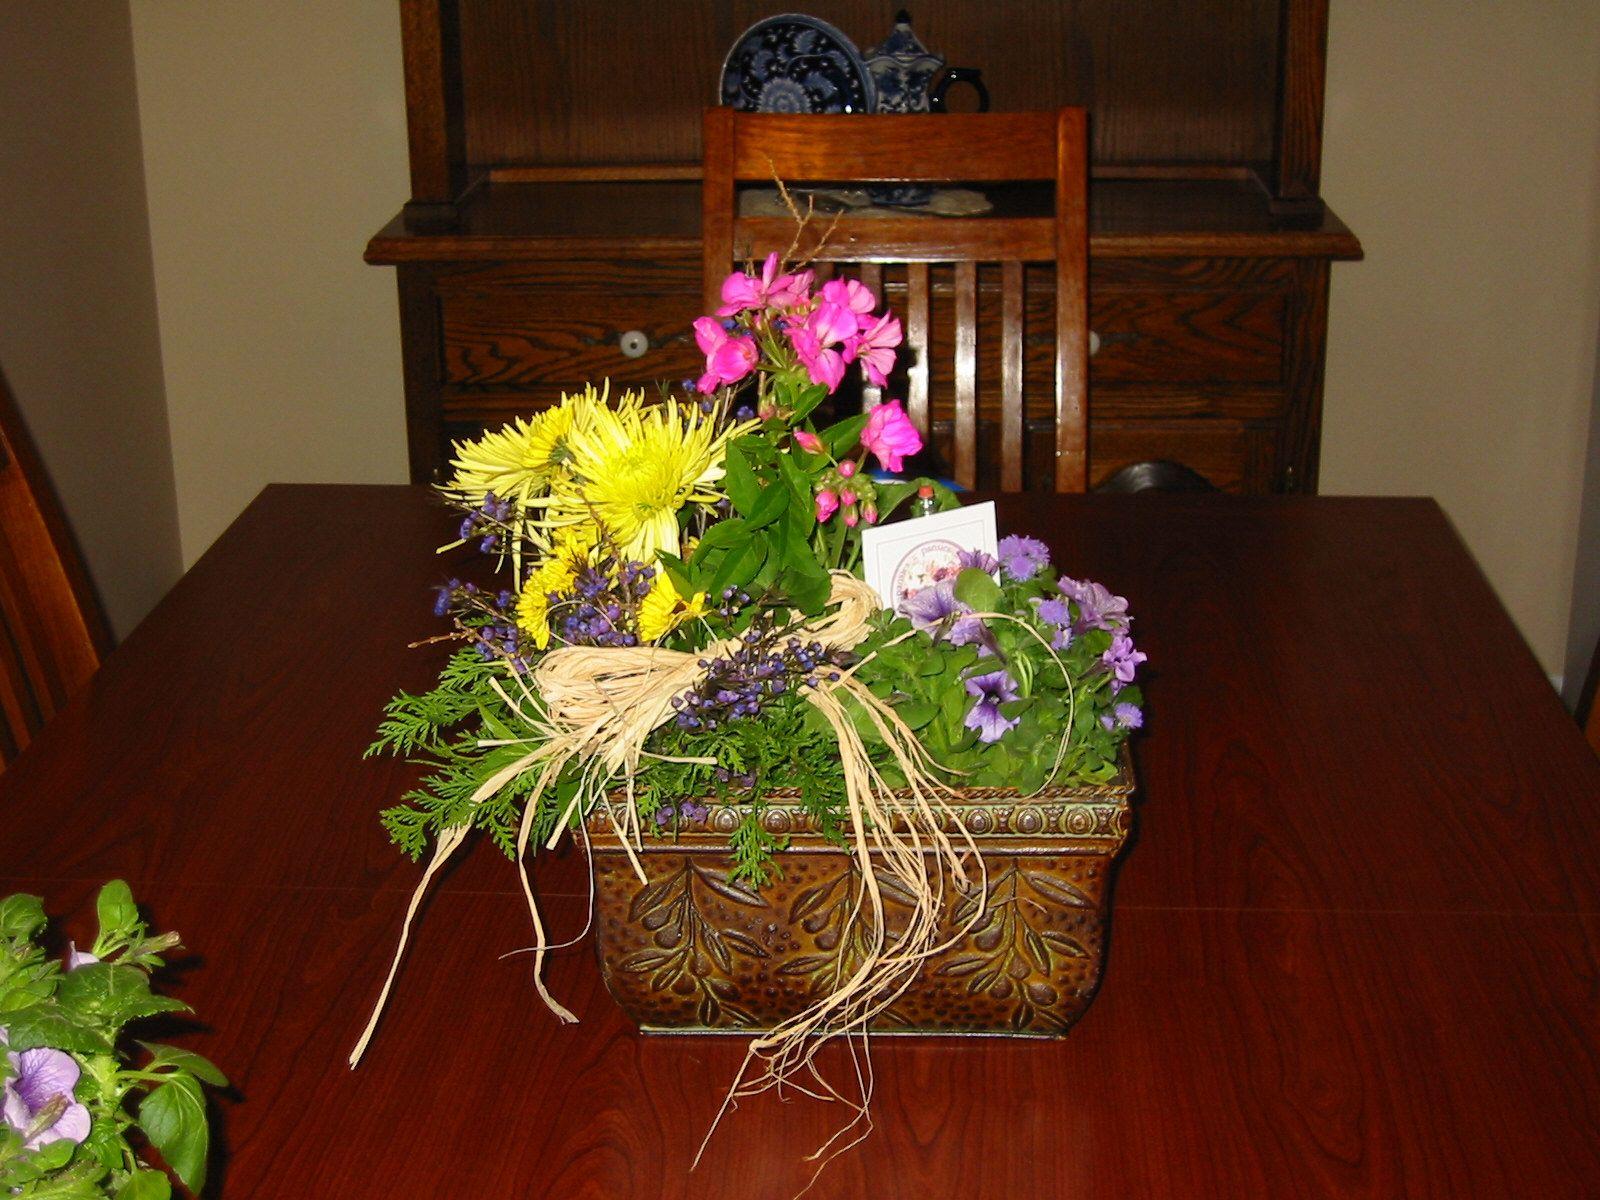 Floral Arrangement (plantable Flowers And Cut Flowers) For Teacher  Appreciation Day